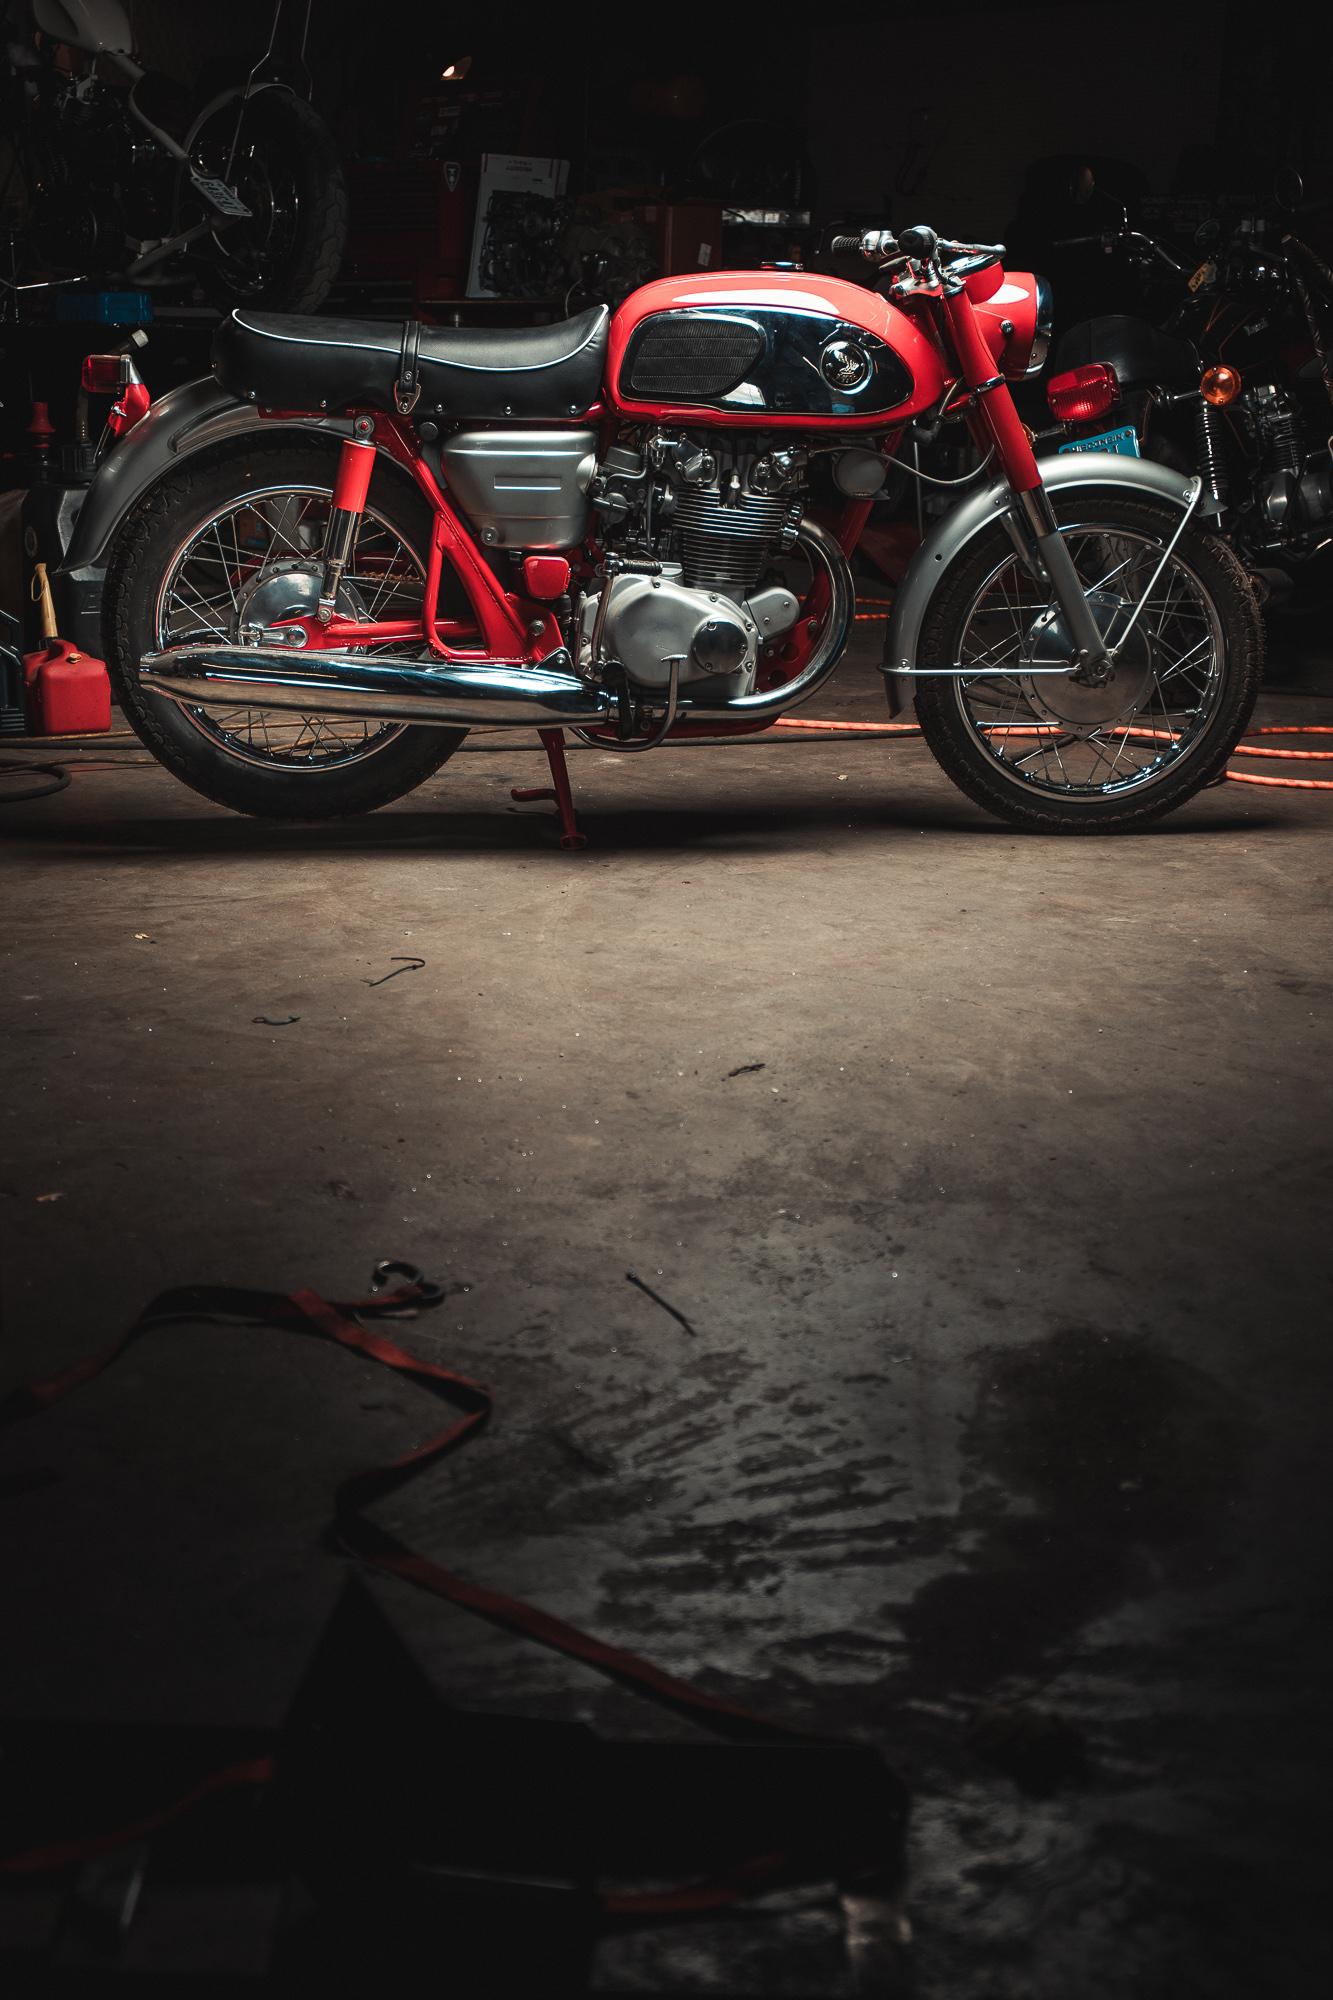 2019-08-19_Rathbone_Motorworks_Tech_Gloves_0179.jpg